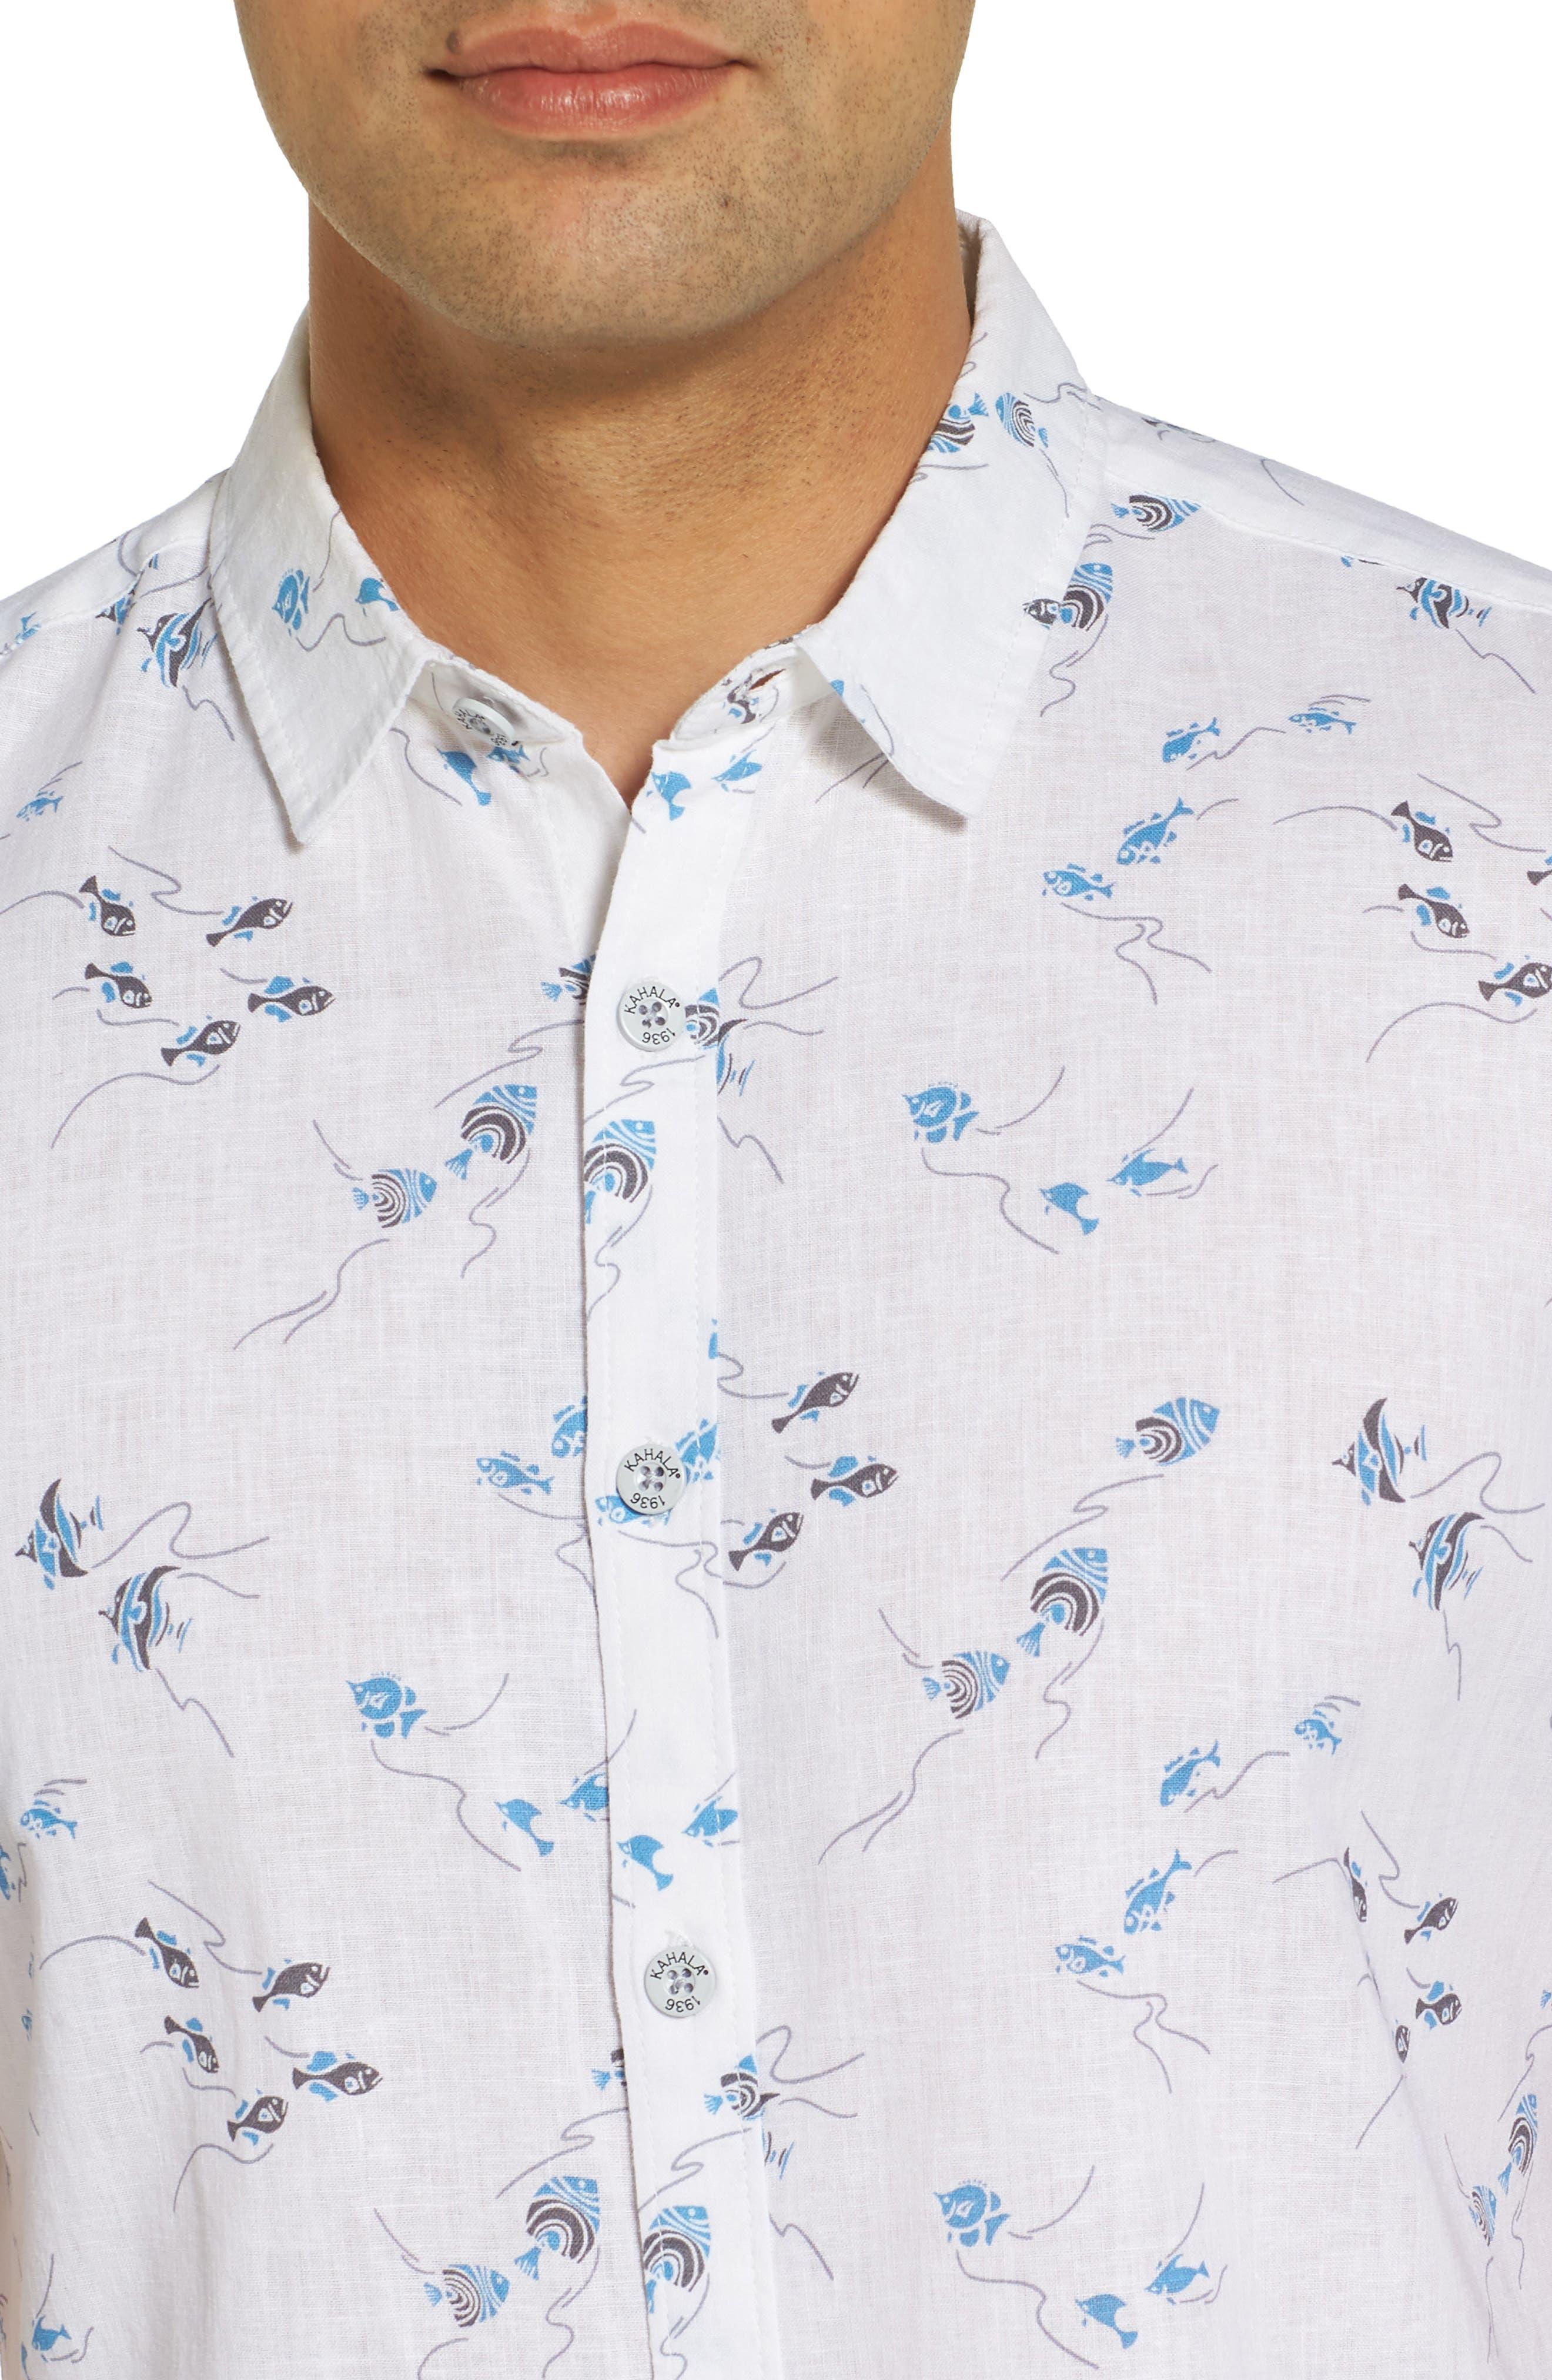 Swim School Standard Fit Linen Blend Camp Shirt,                             Alternate thumbnail 4, color,                             White